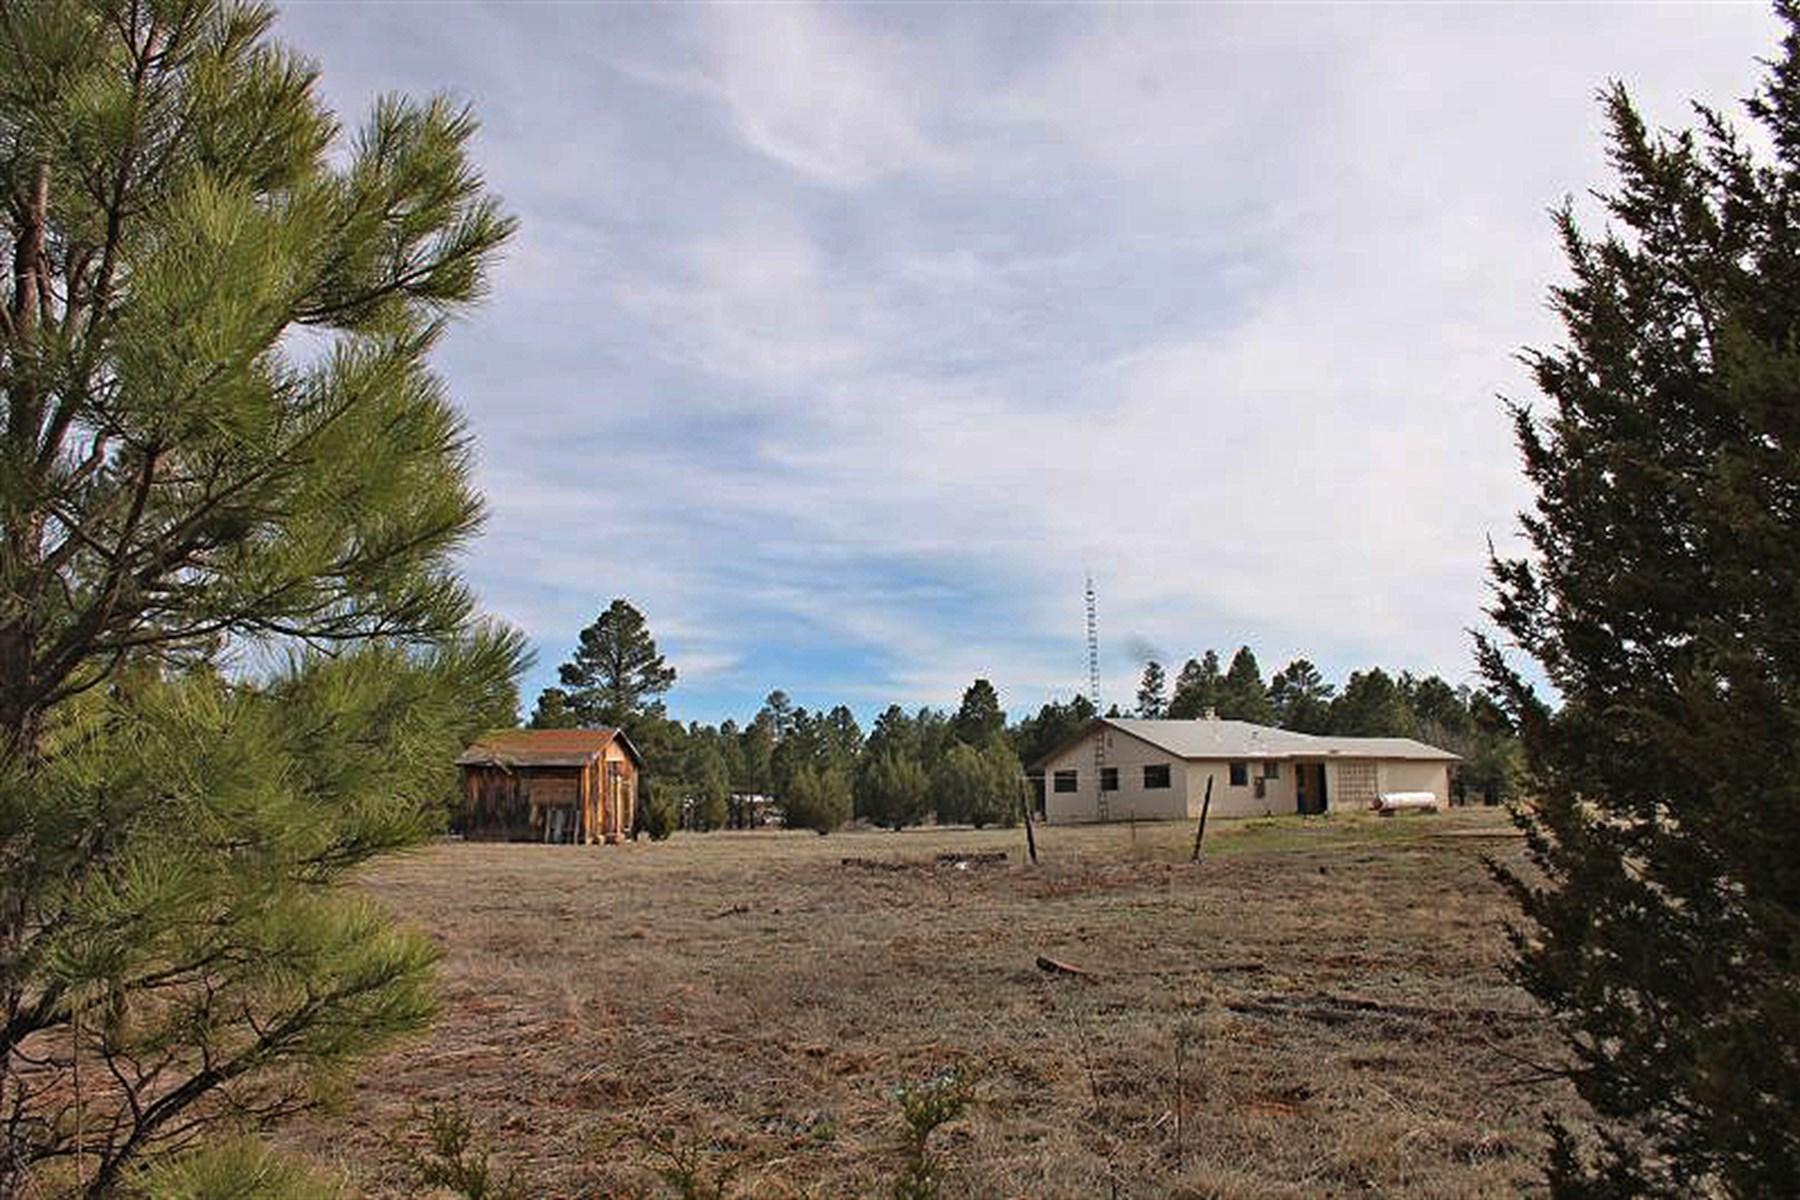 Moradia para Venda às Perfect Place for Commerical Use 2819 AZ-260 RD Overgaard, Arizona, 85933 Estados Unidos